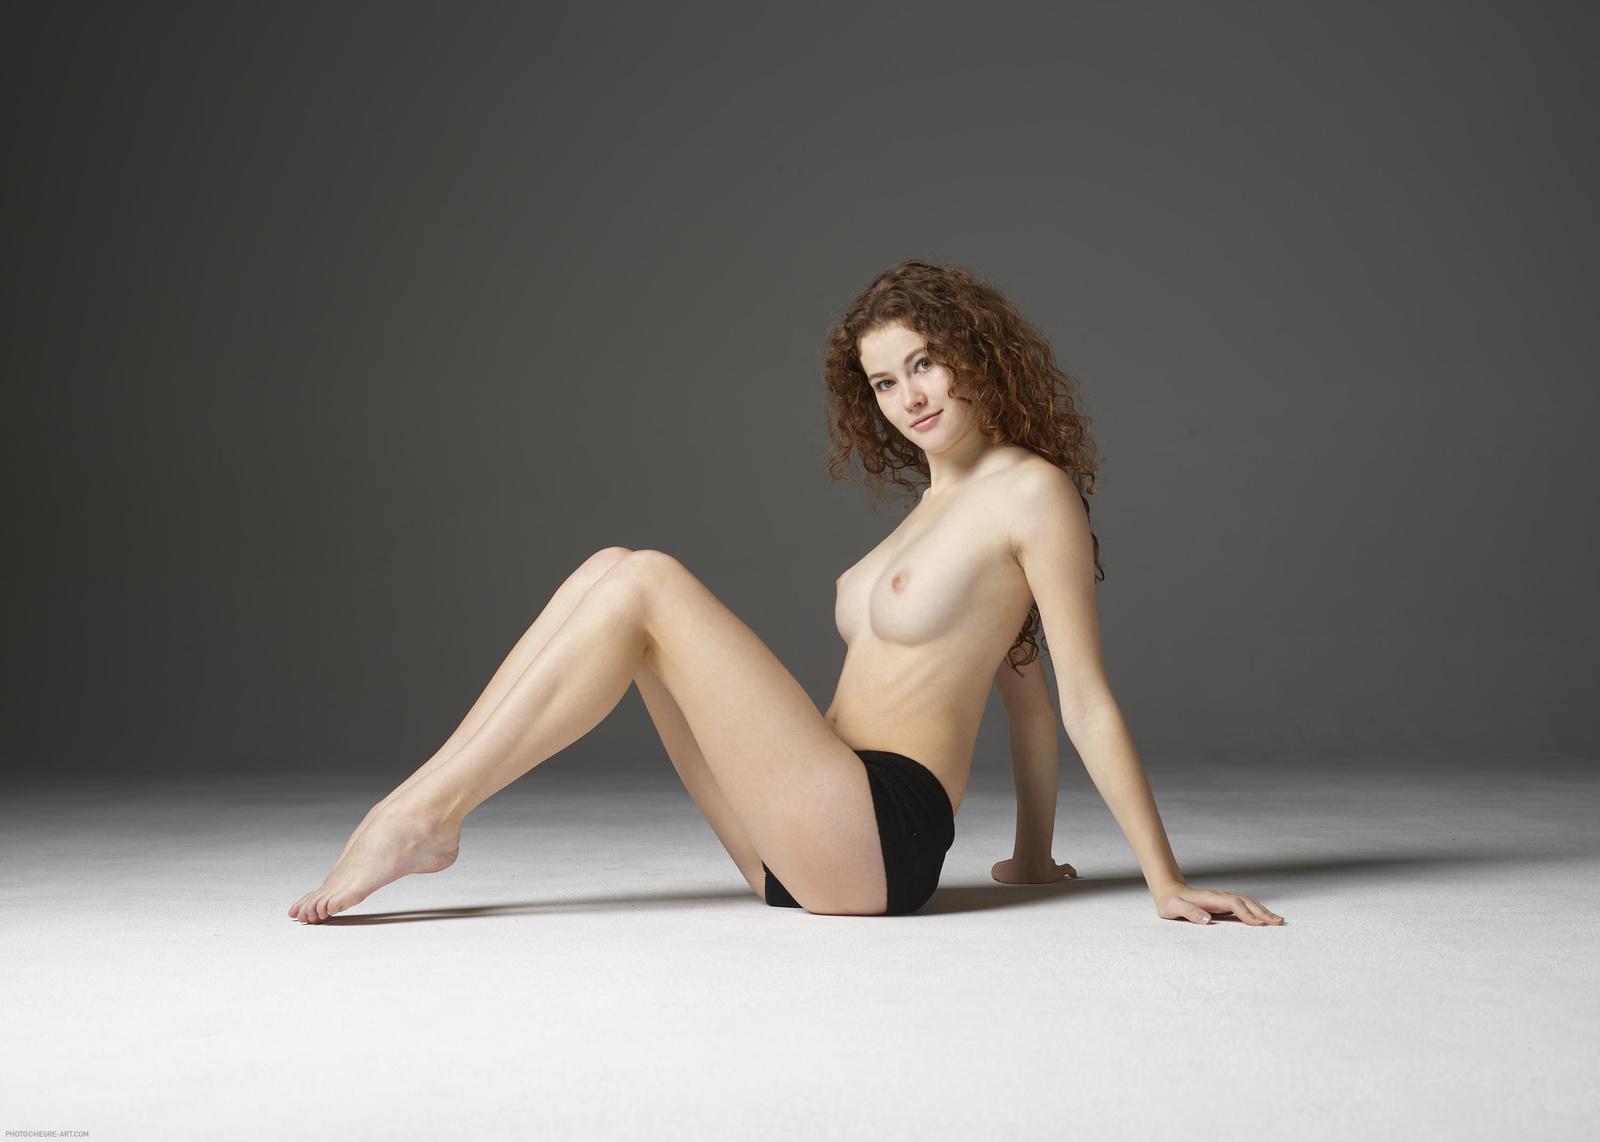 Heidi bruehl nude, fappening, sexy photos, uncensored